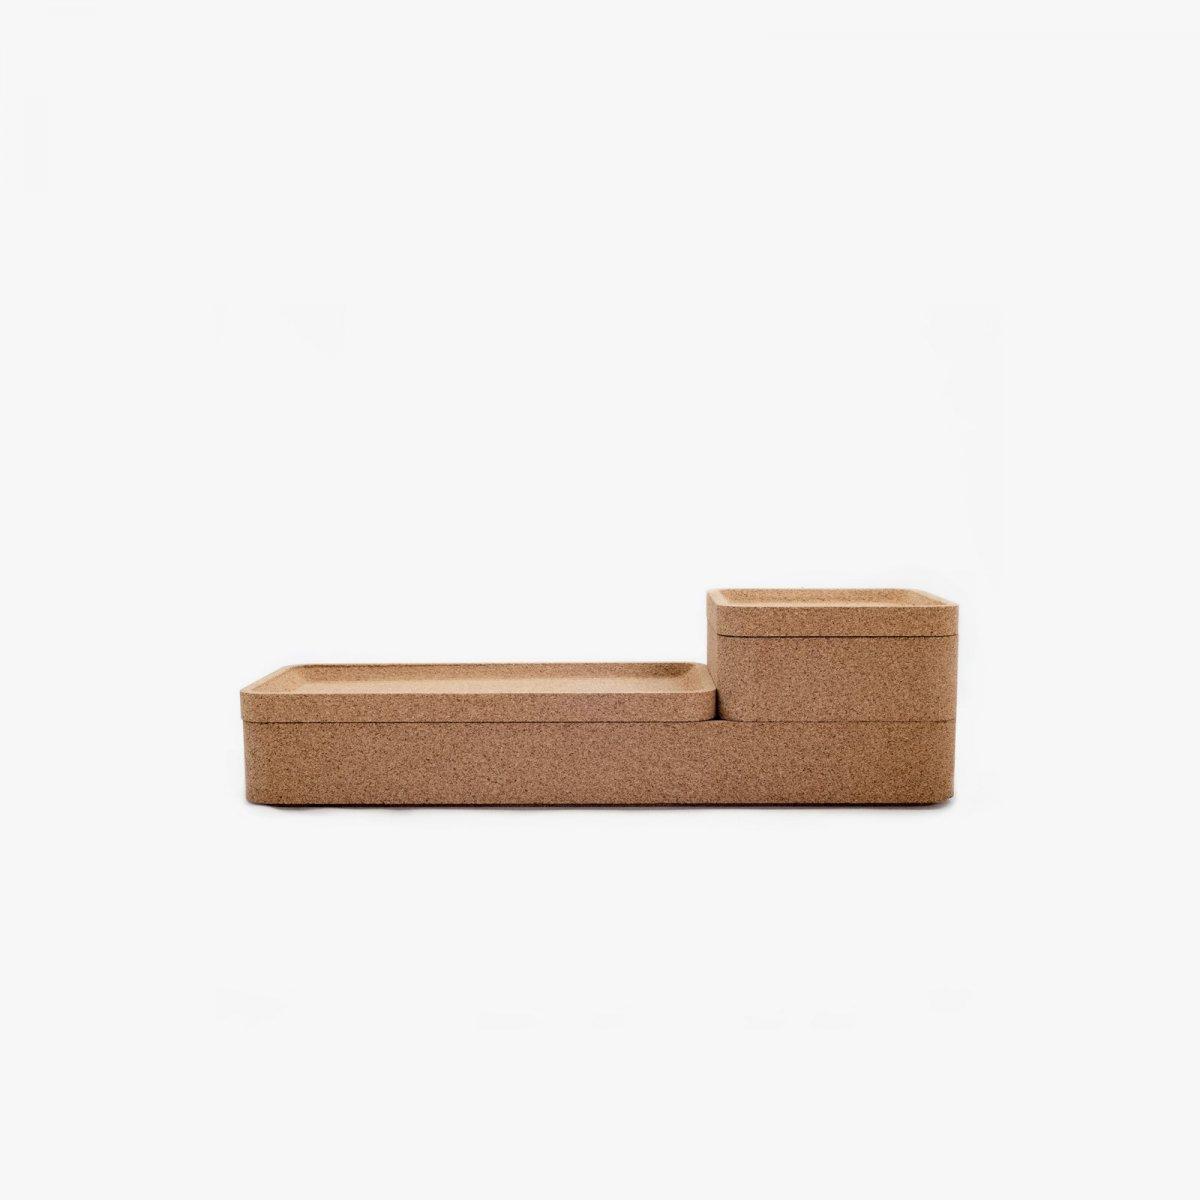 Trove Base Tray with Small Square Box.